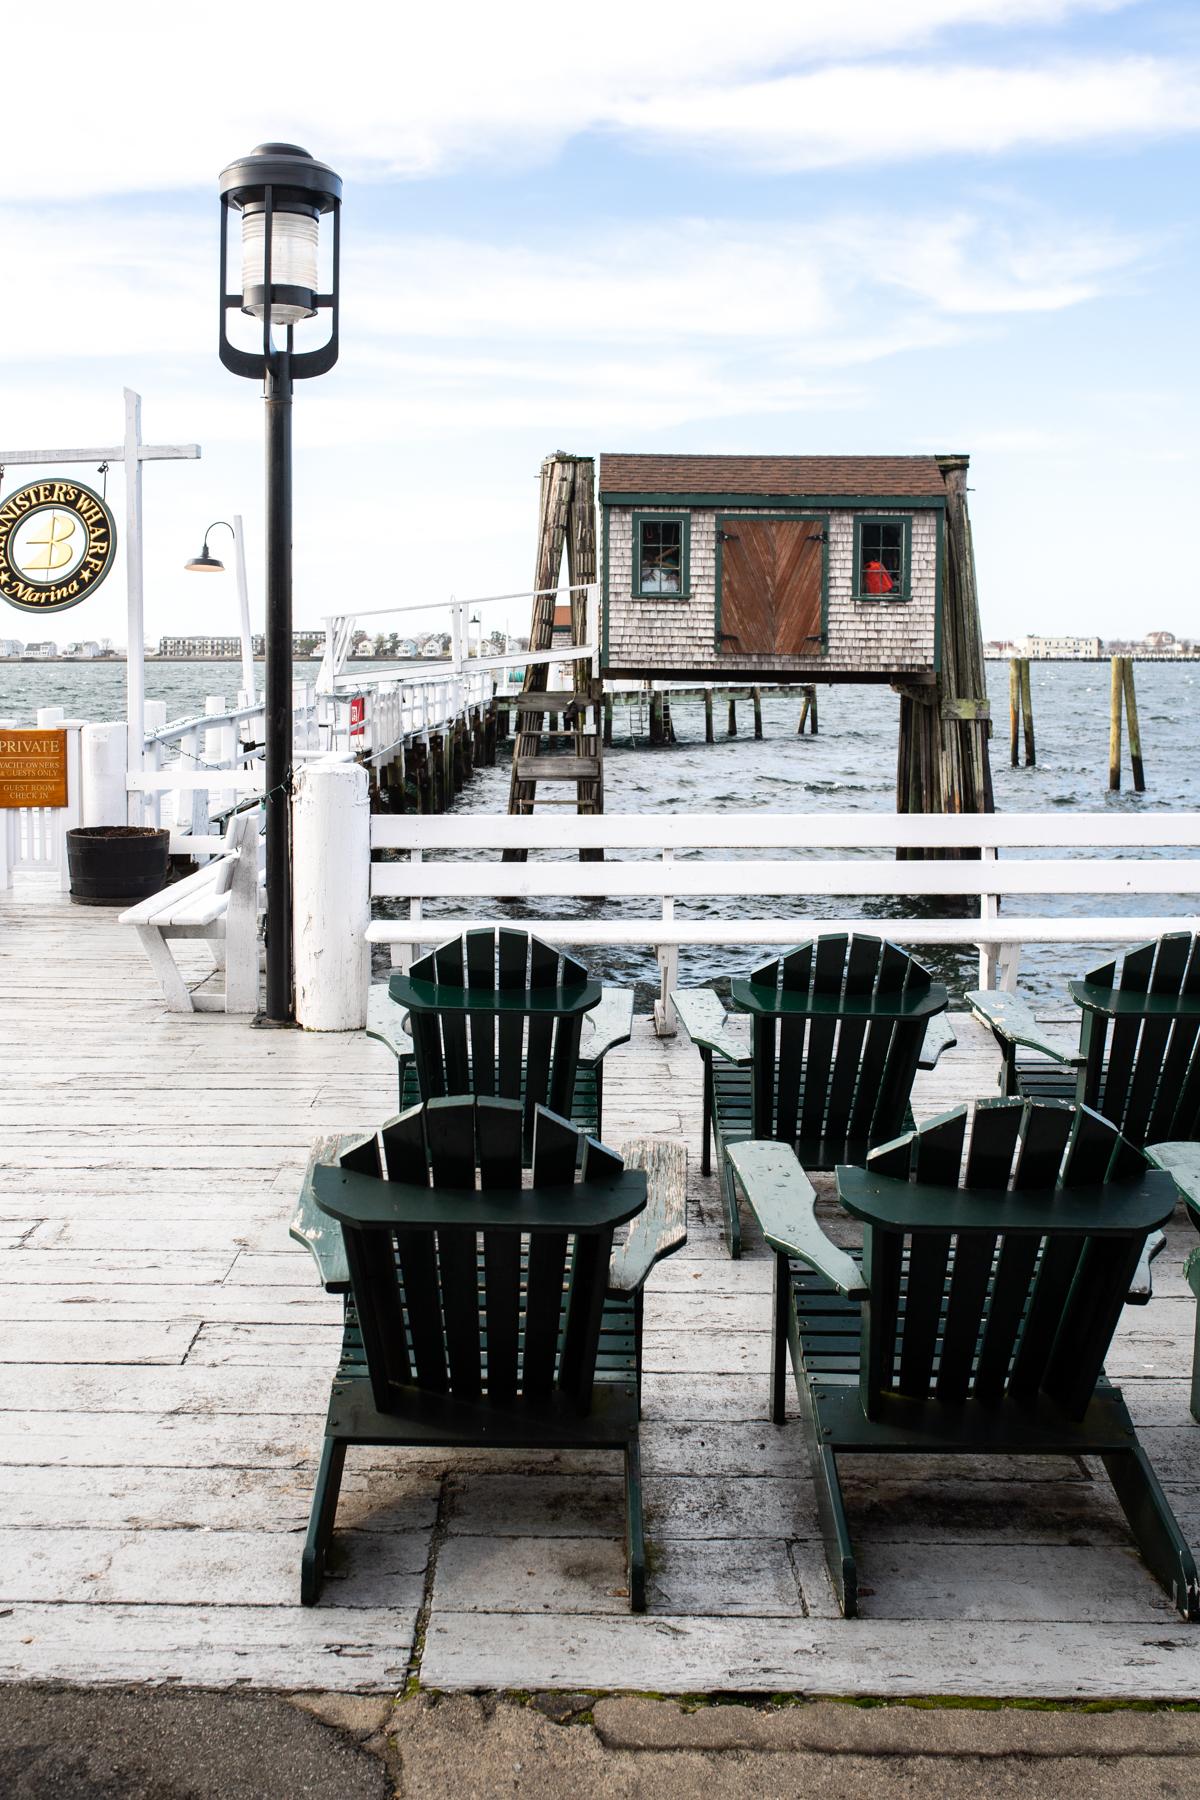 Newport%2C Rhode Island Weekend Travel Guide x Stacie Flinner-53.jpg